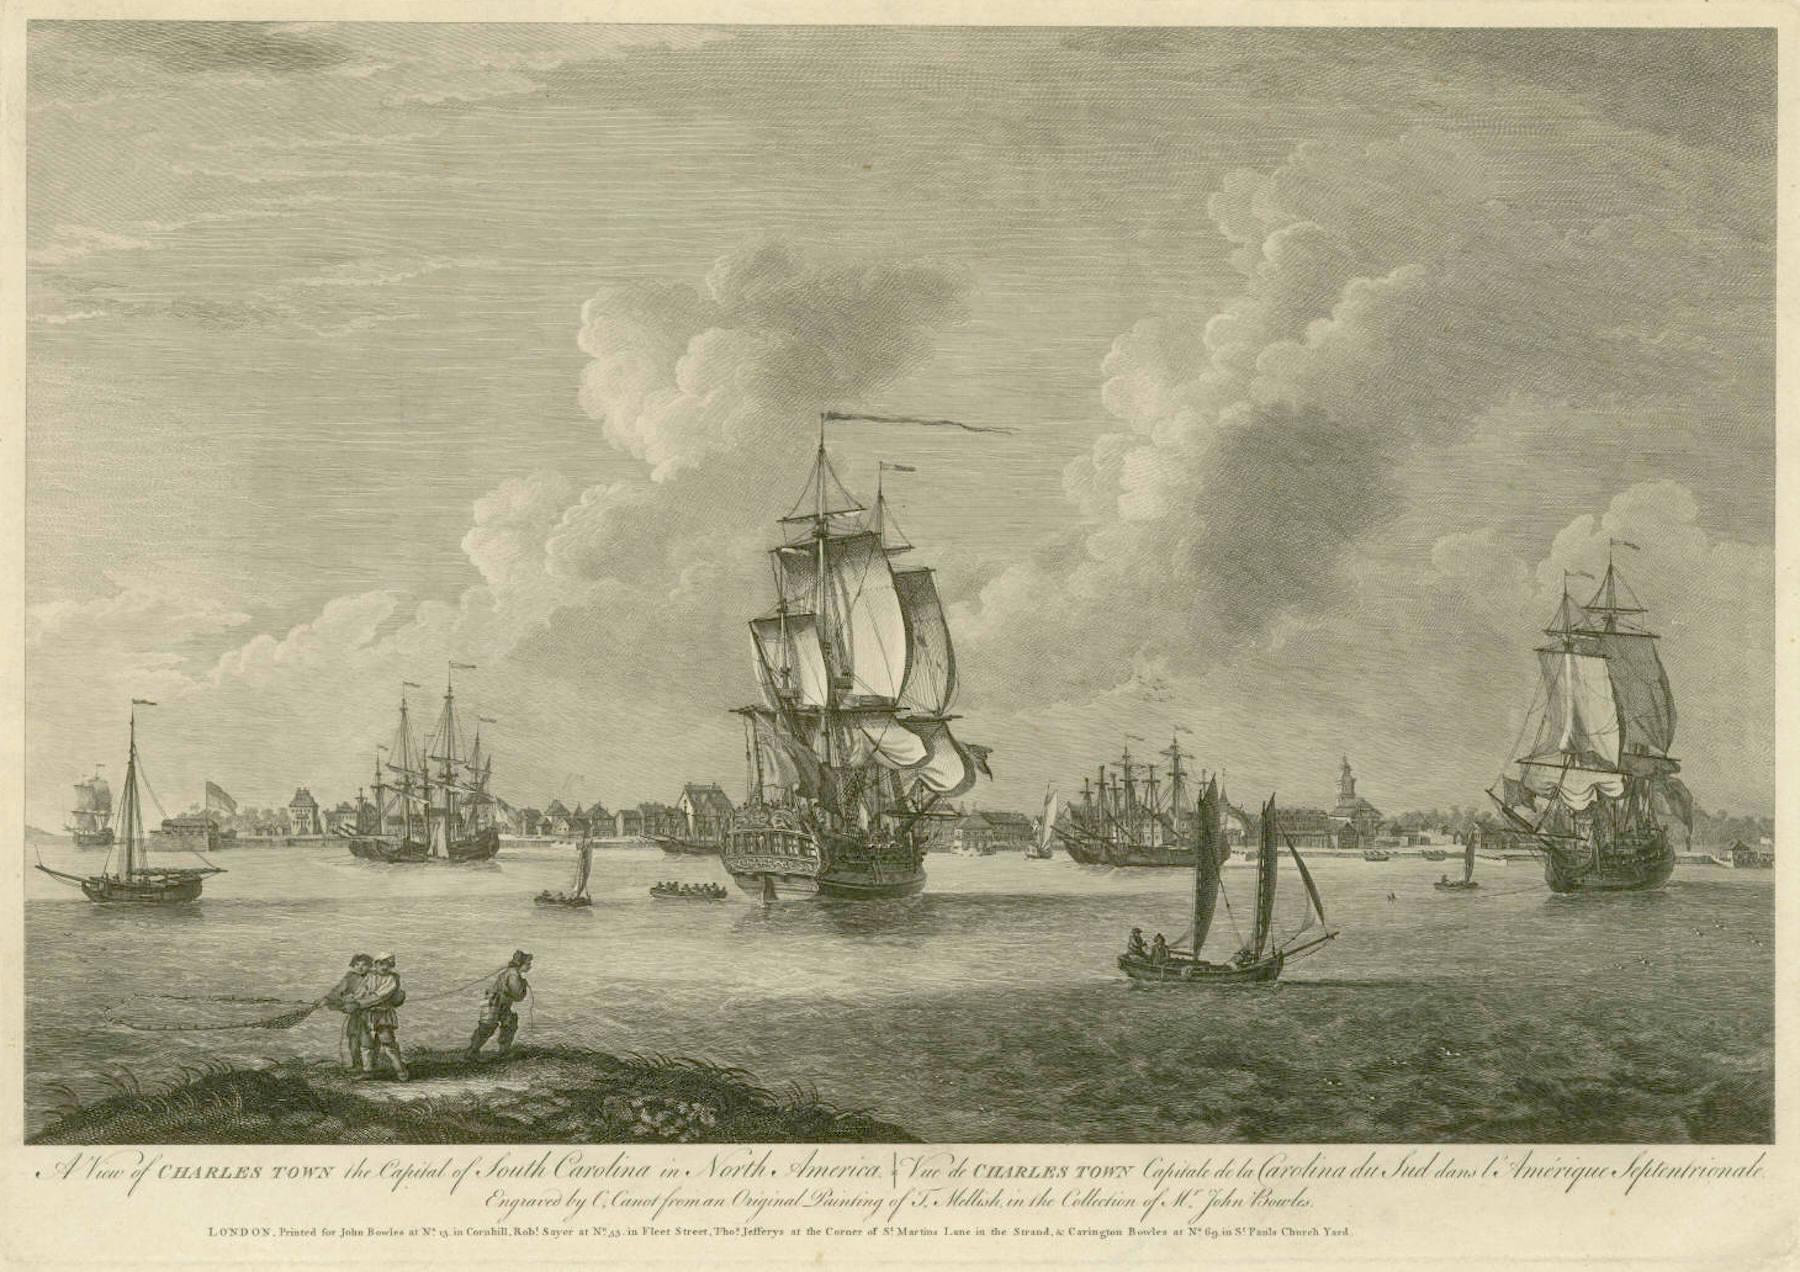 Captain Thomas Hayward's Poetic Description of 1769 Charles Town